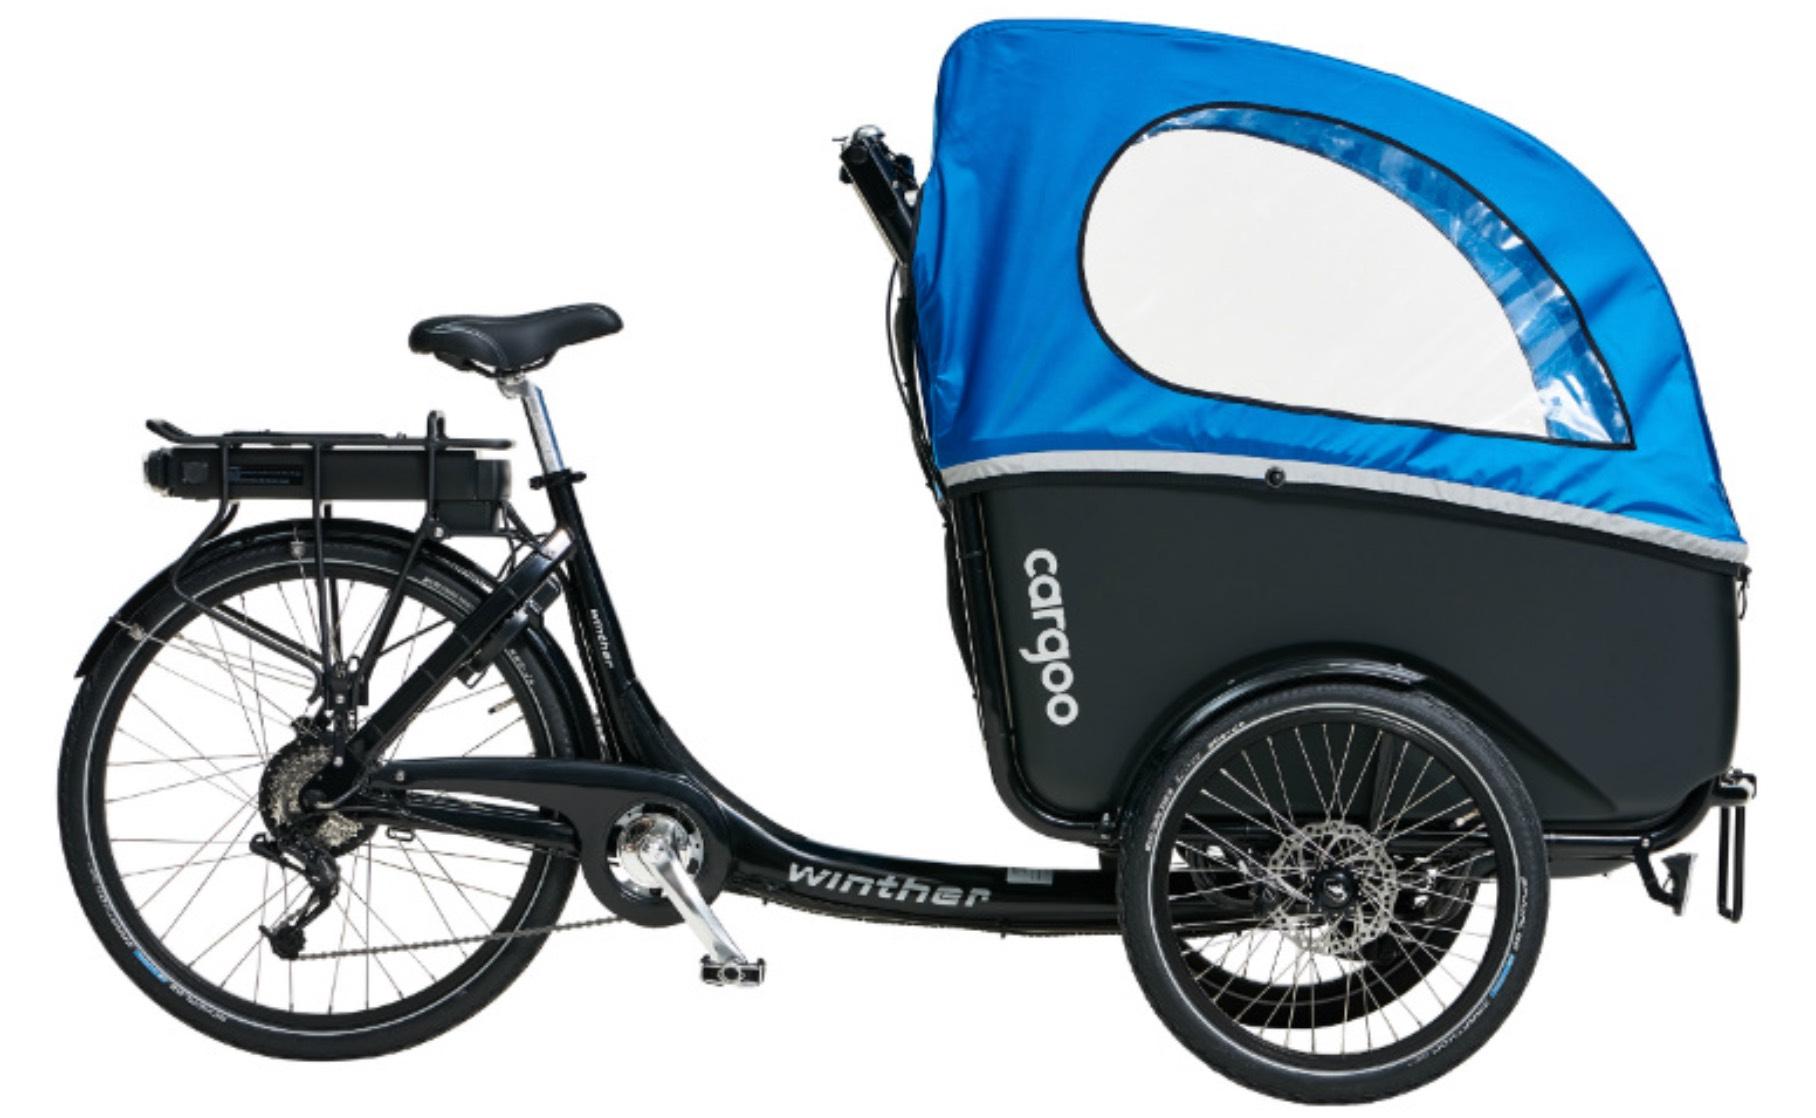 winther Cargoo E-Bikes